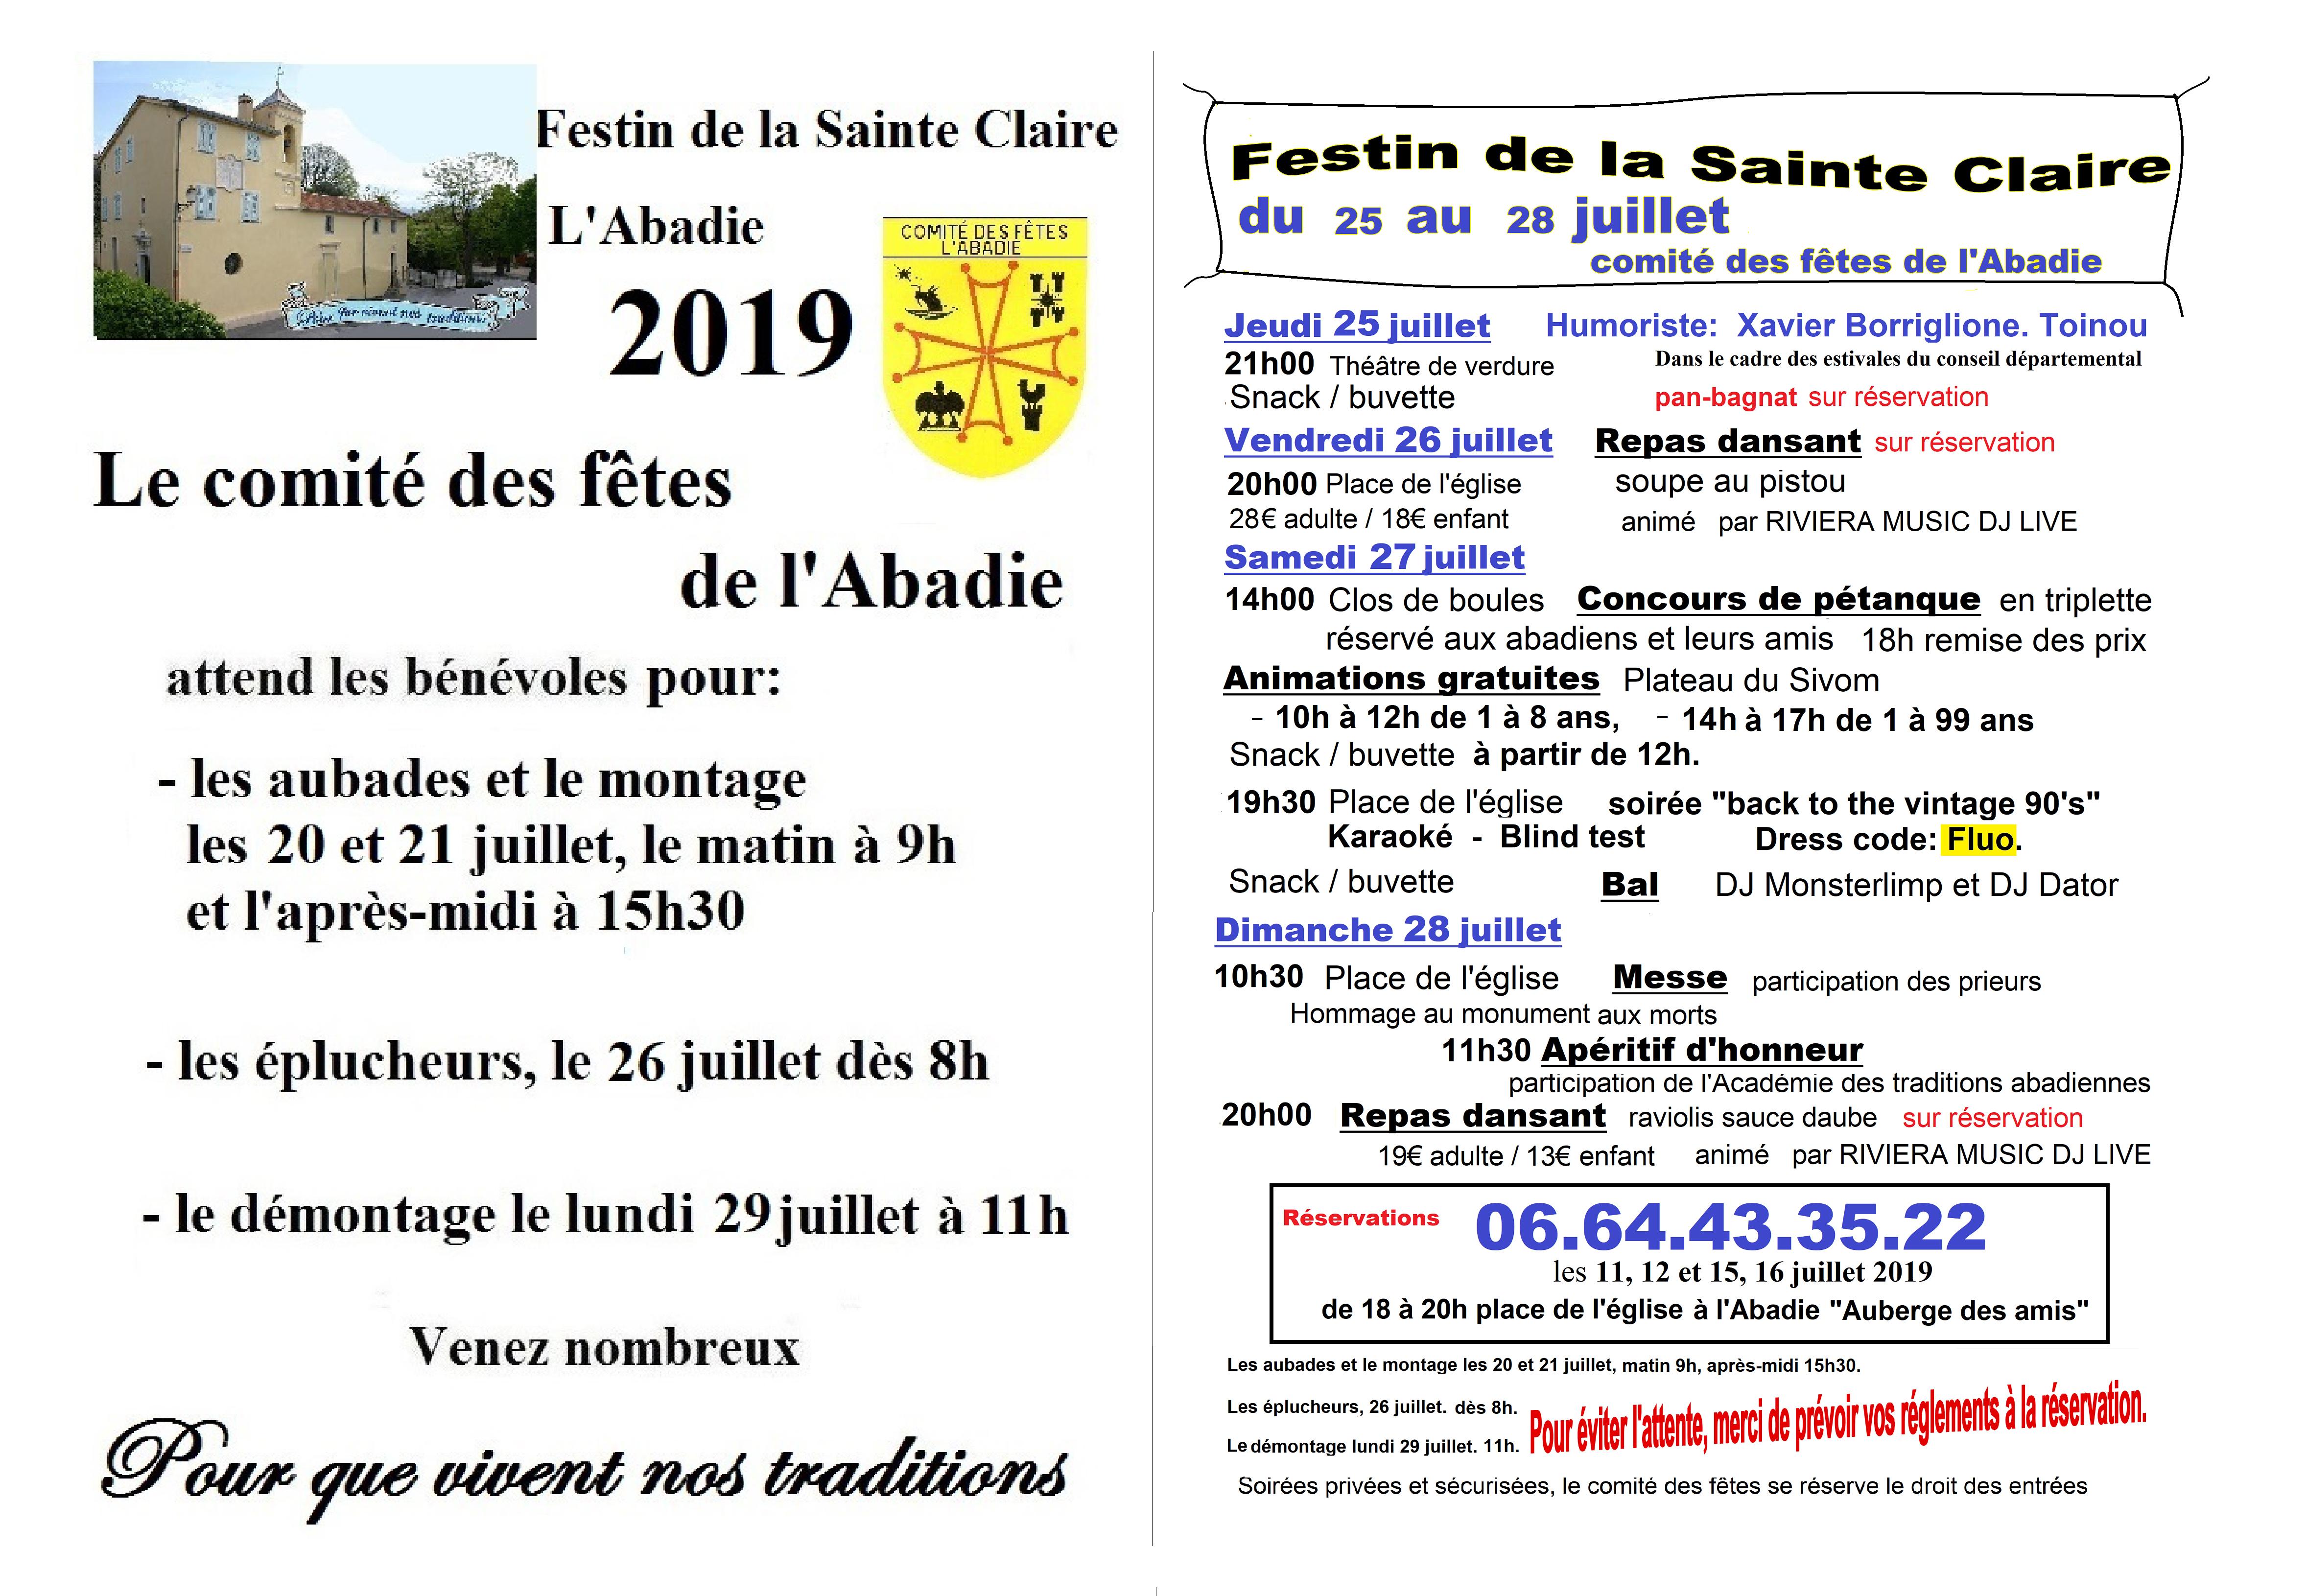 Festin de la Sainte Claire